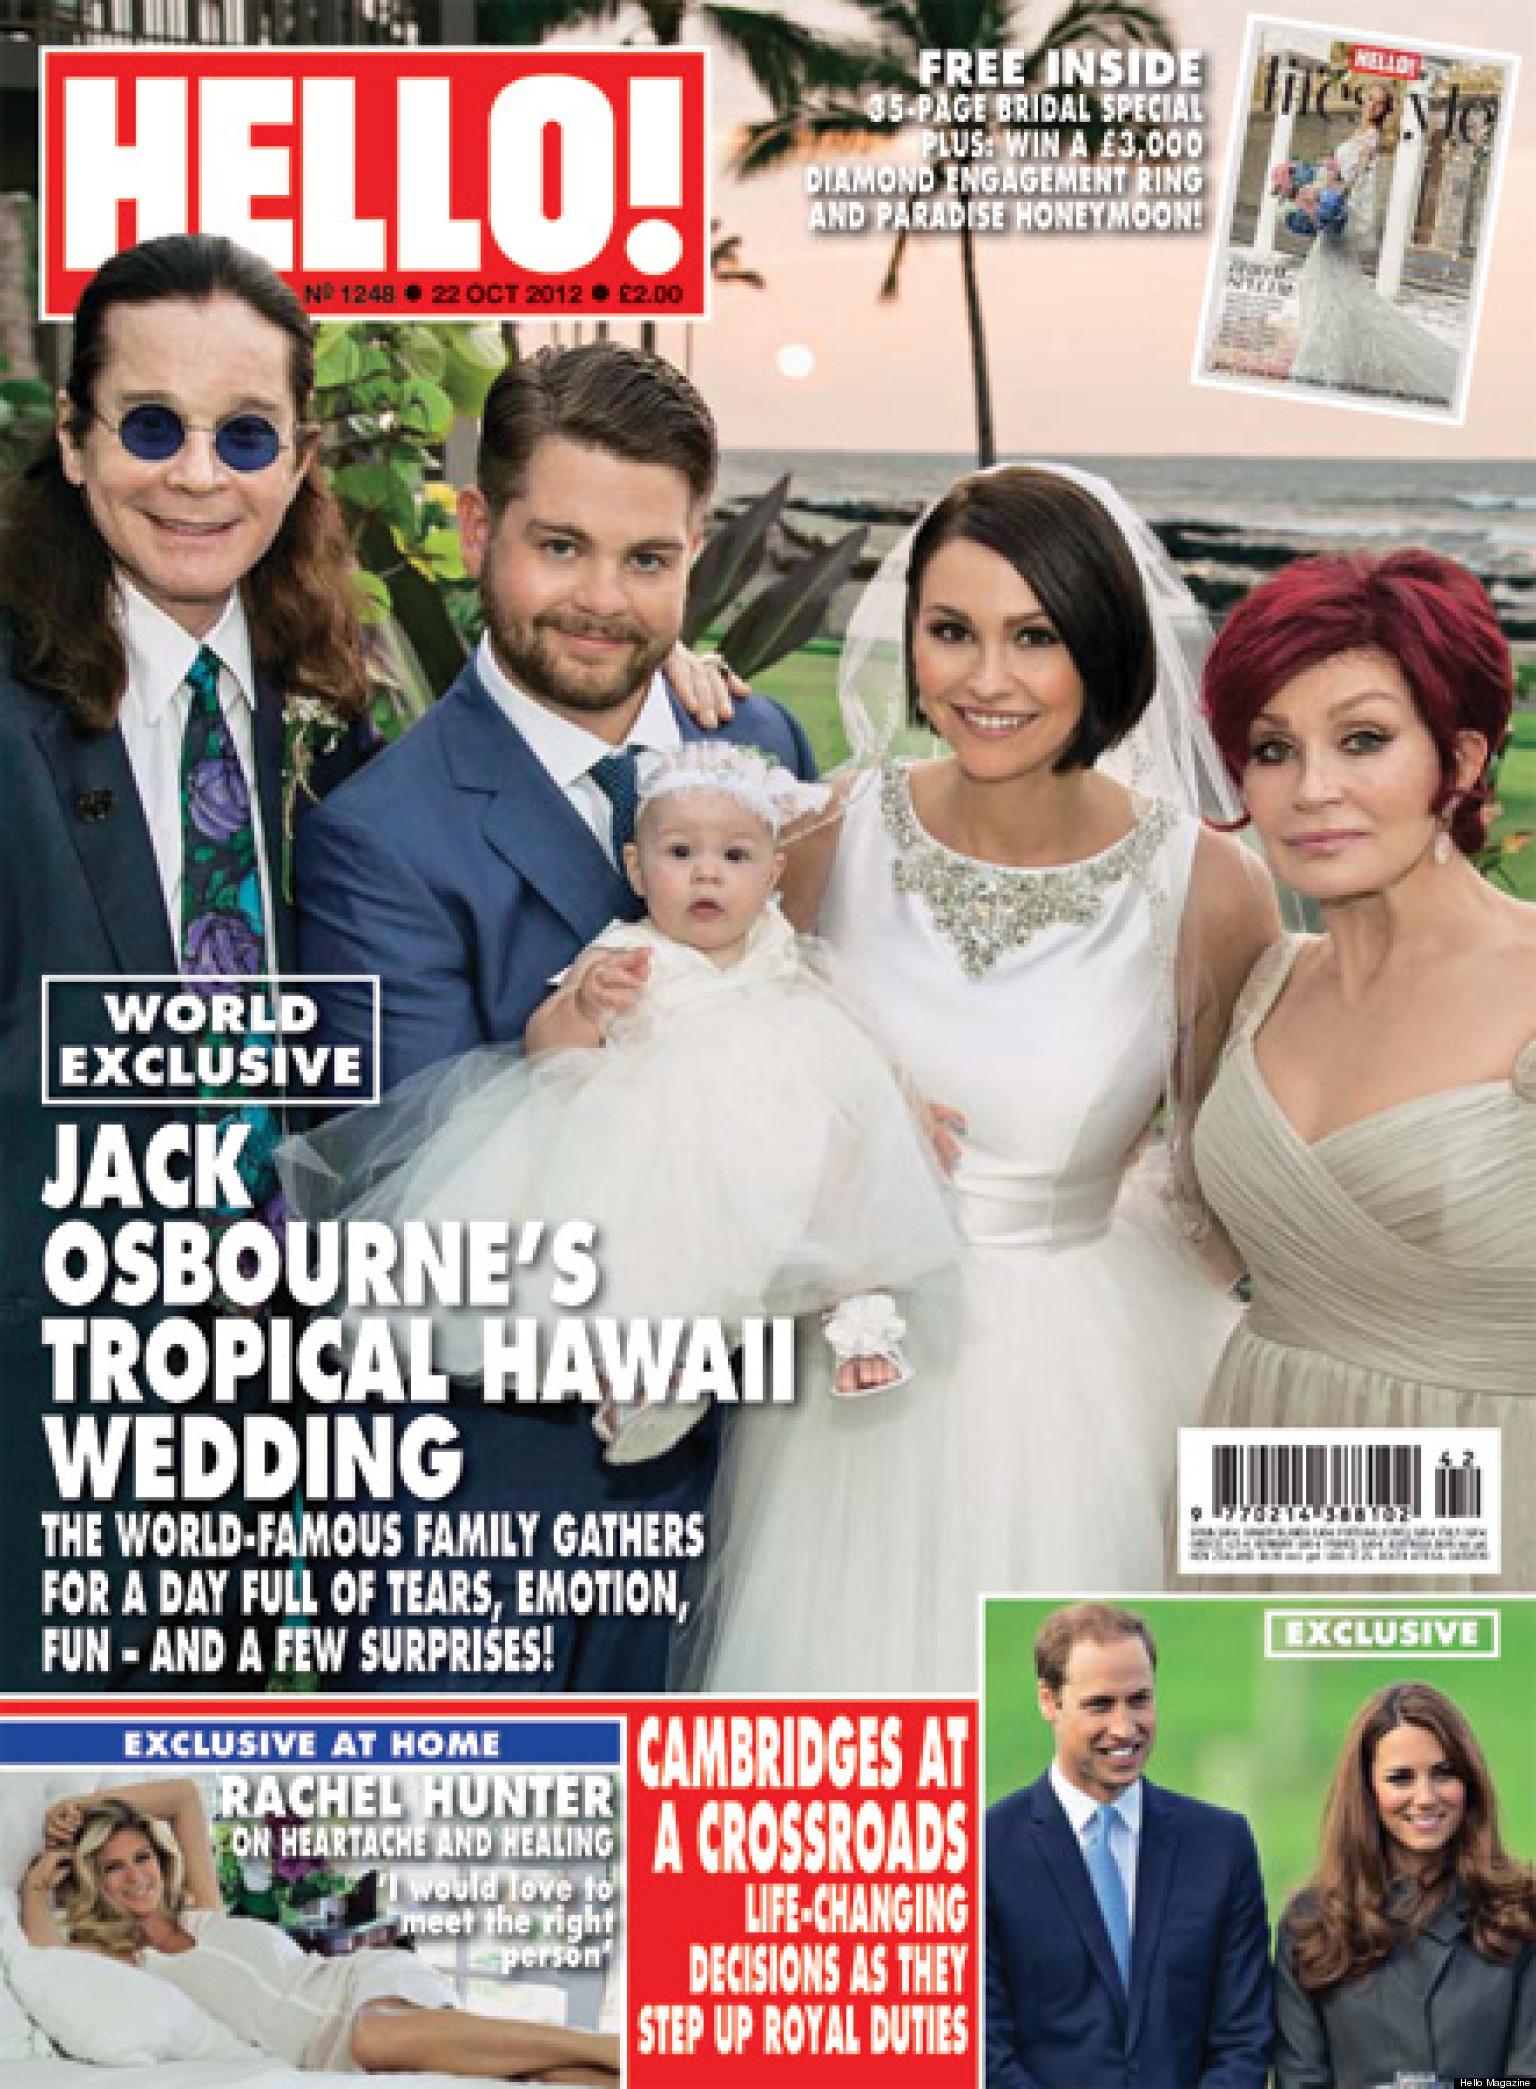 jack osbournes wedding star poses with wife lisa stelly